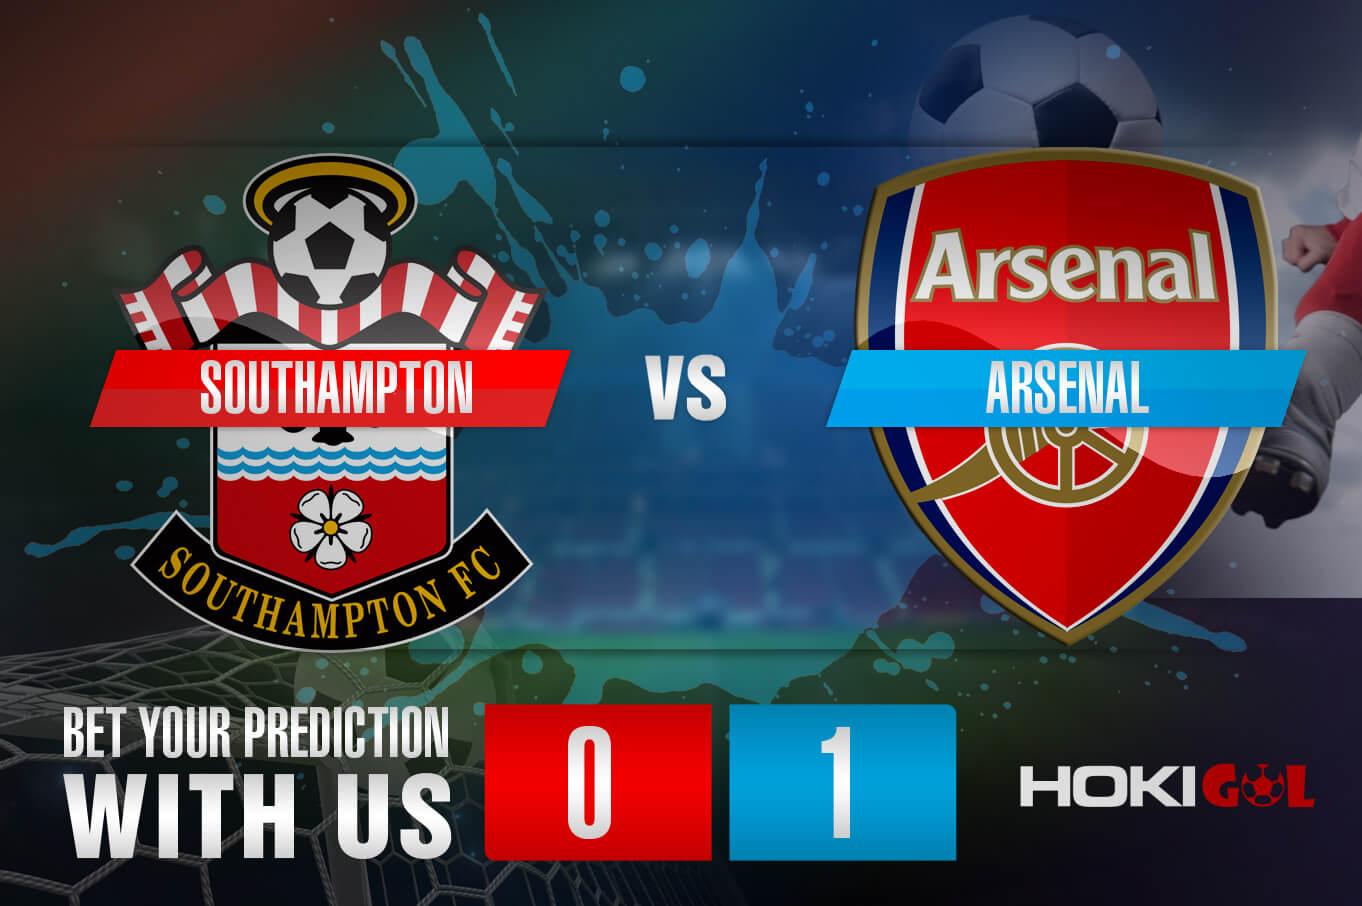 Prediksi Bola Southampton Vs Arsenal 23 Januari 2021